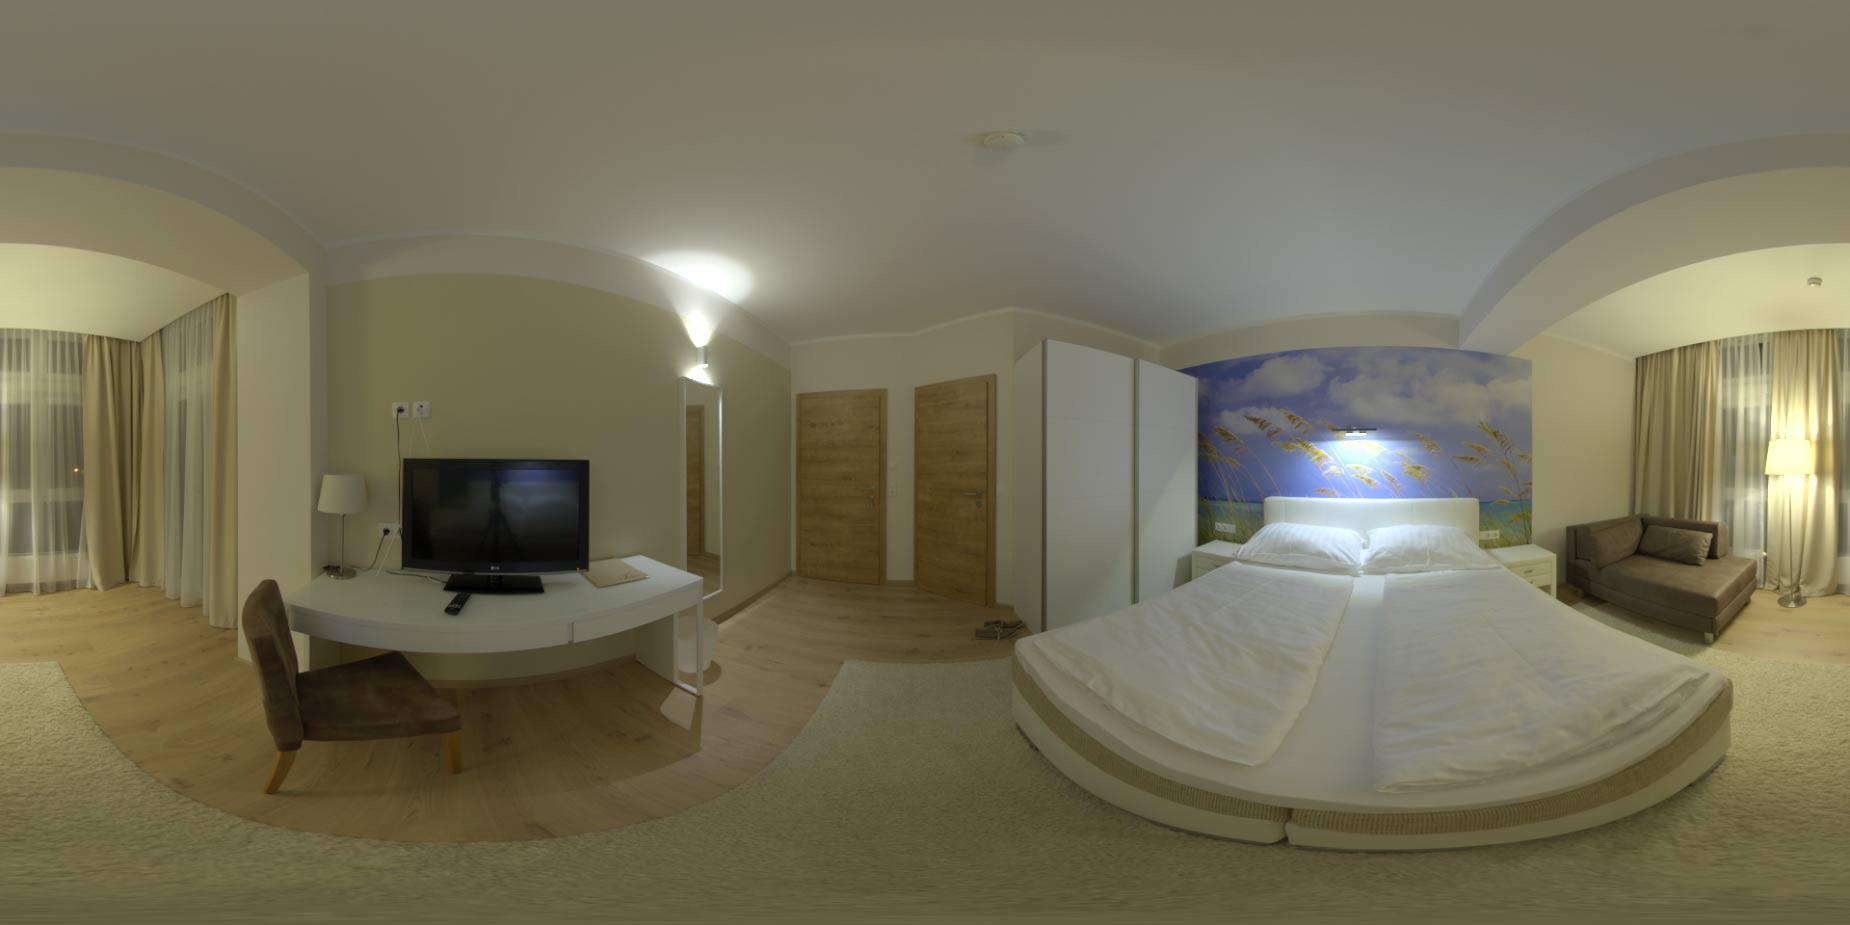 Hdri 360 Hotel Room Indoor Openfootage